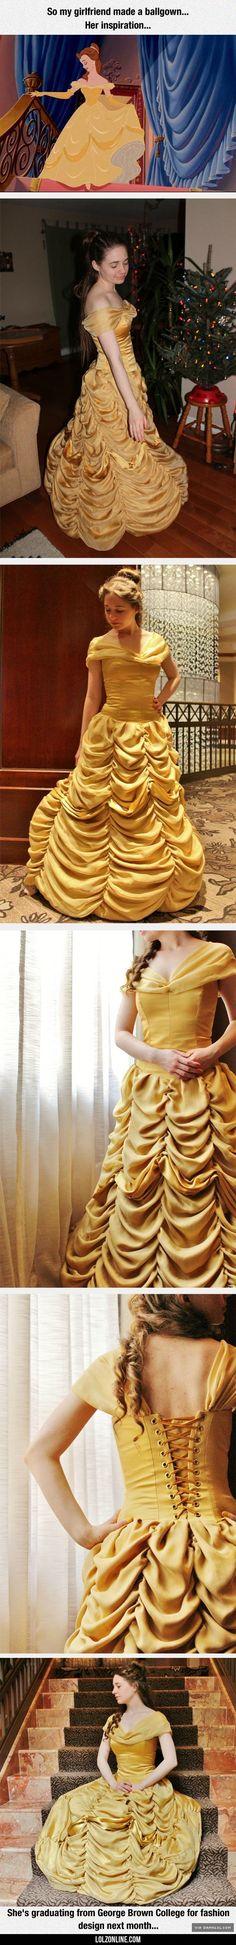 Amazing Dress Inspired By A Disney Princess#funny #lol #lolzonline